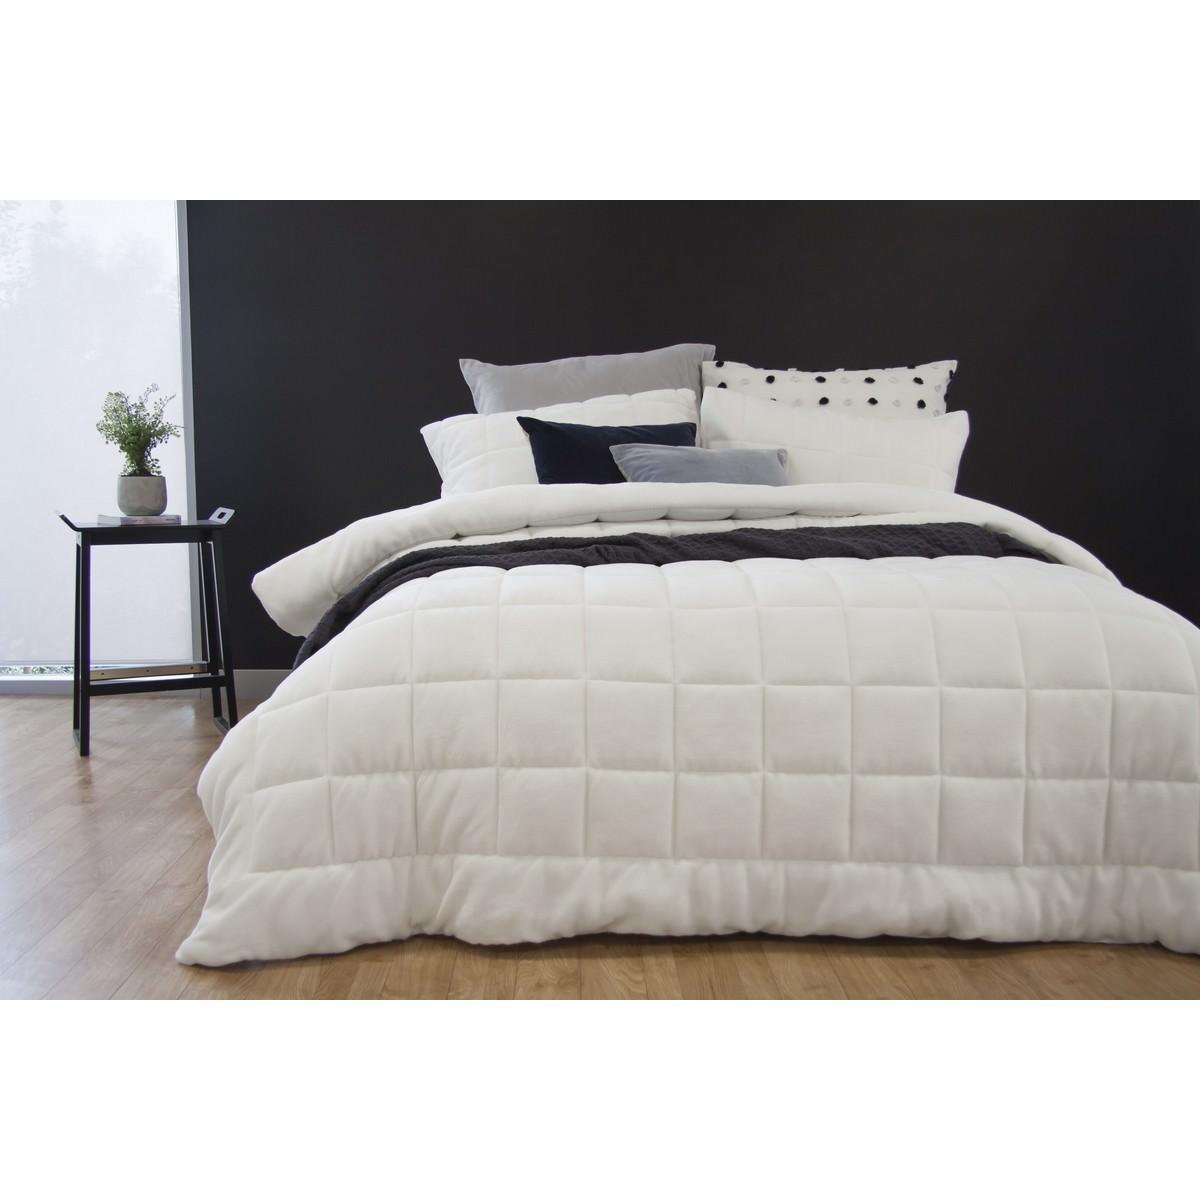 Ardor Faux Mink Comforter Set, Queen / King, White